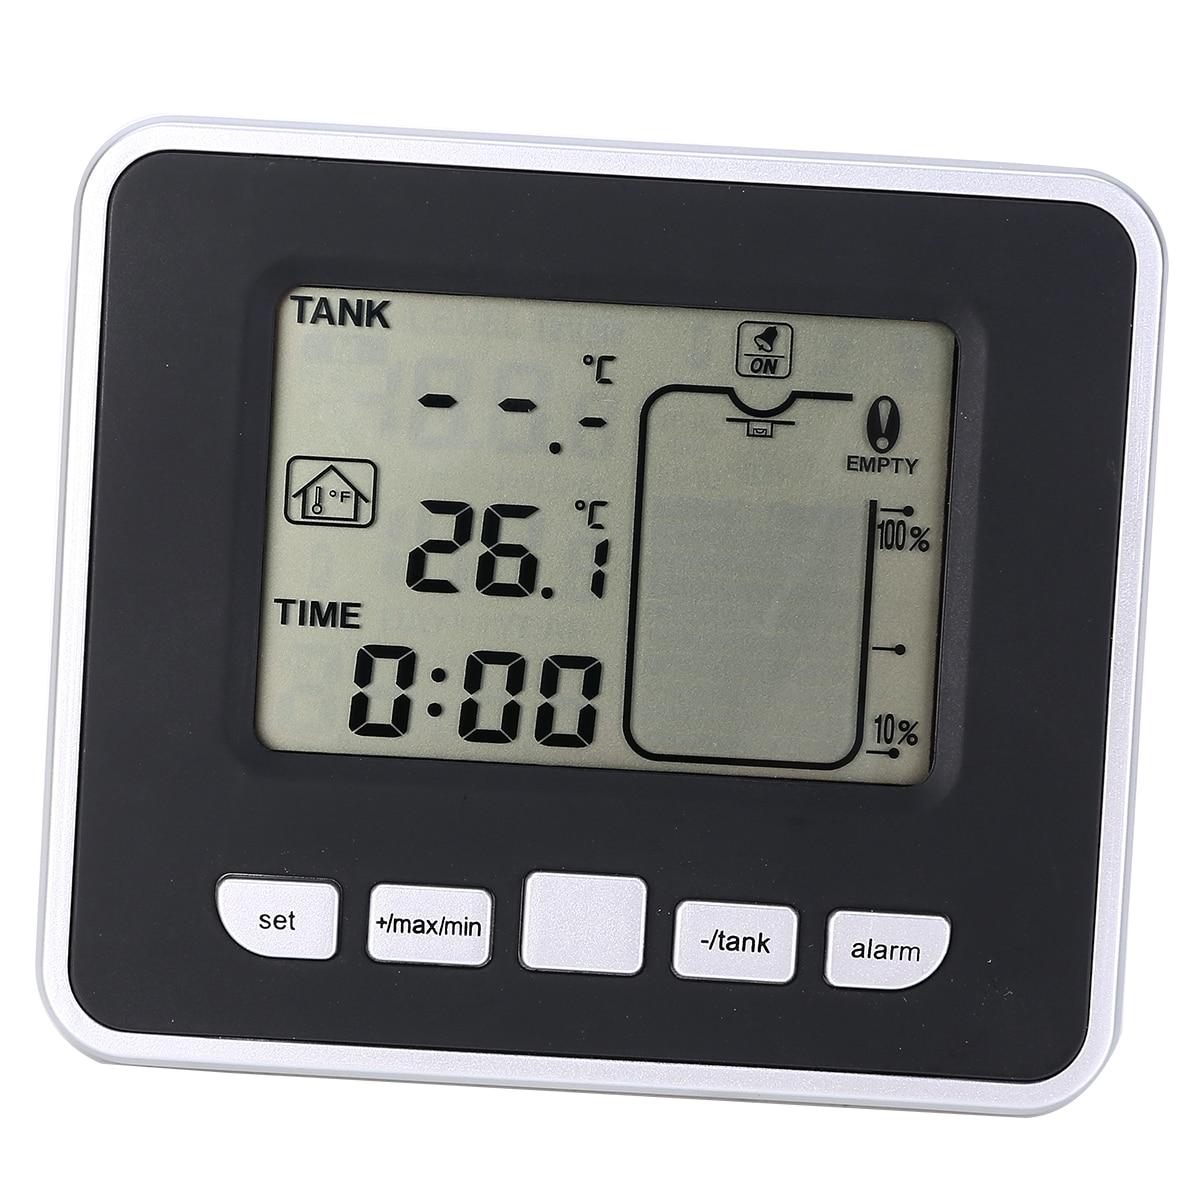 Ultrasonic Water Tank Level Meter Temperature Sensor Low battery Liquid Depth Indicator Time Alarm Transmitter Measuring Tools in Level Measuring Instruments from Tools